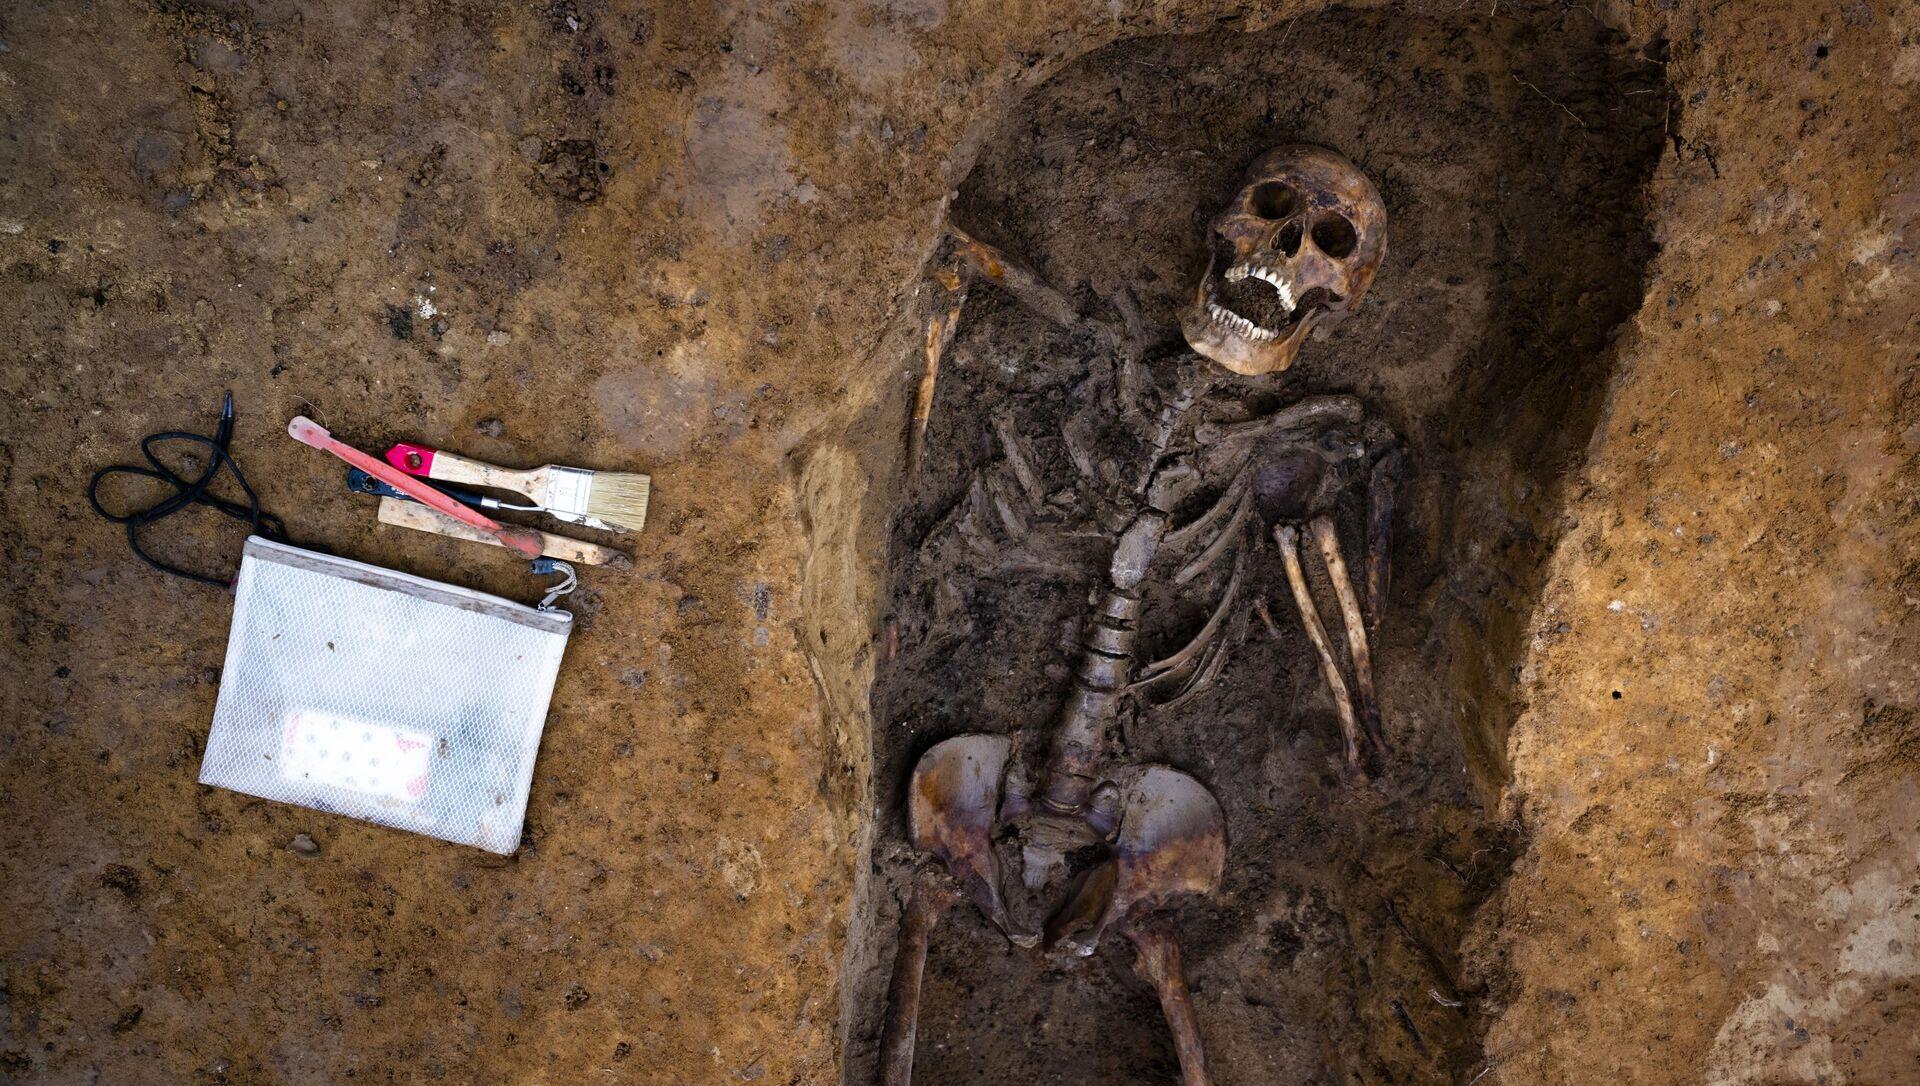 Скелет человека, фото из архива - Sputnik Azərbaycan, 1920, 15.09.2021